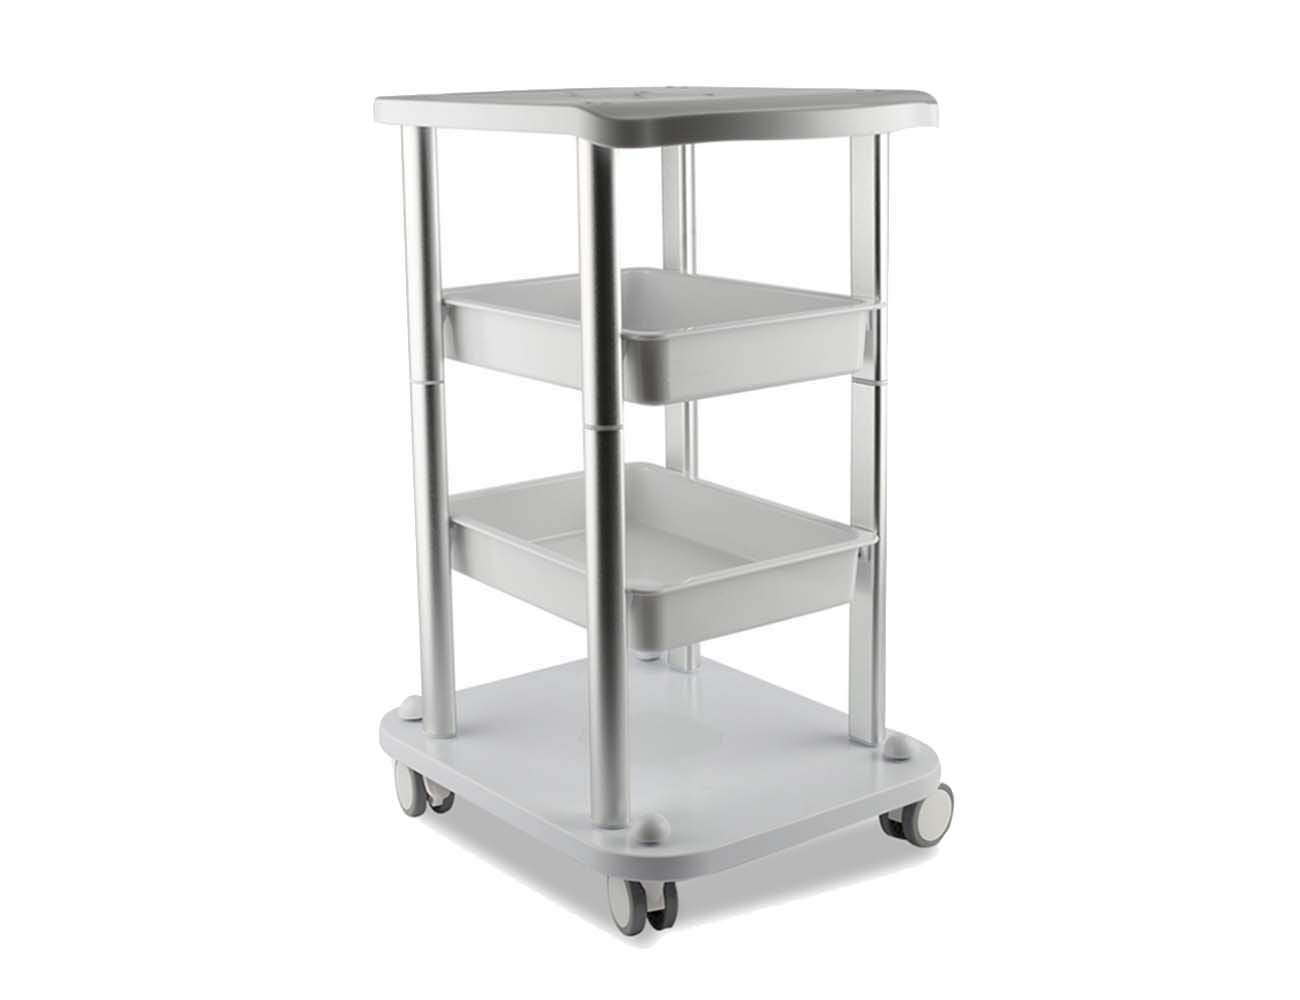 Beauty Salon Furniture Trolley Spa Styling Pedestal Rolling Cart 2 Storage Trays 4 Layers ABS Elitzia ETTRO5S